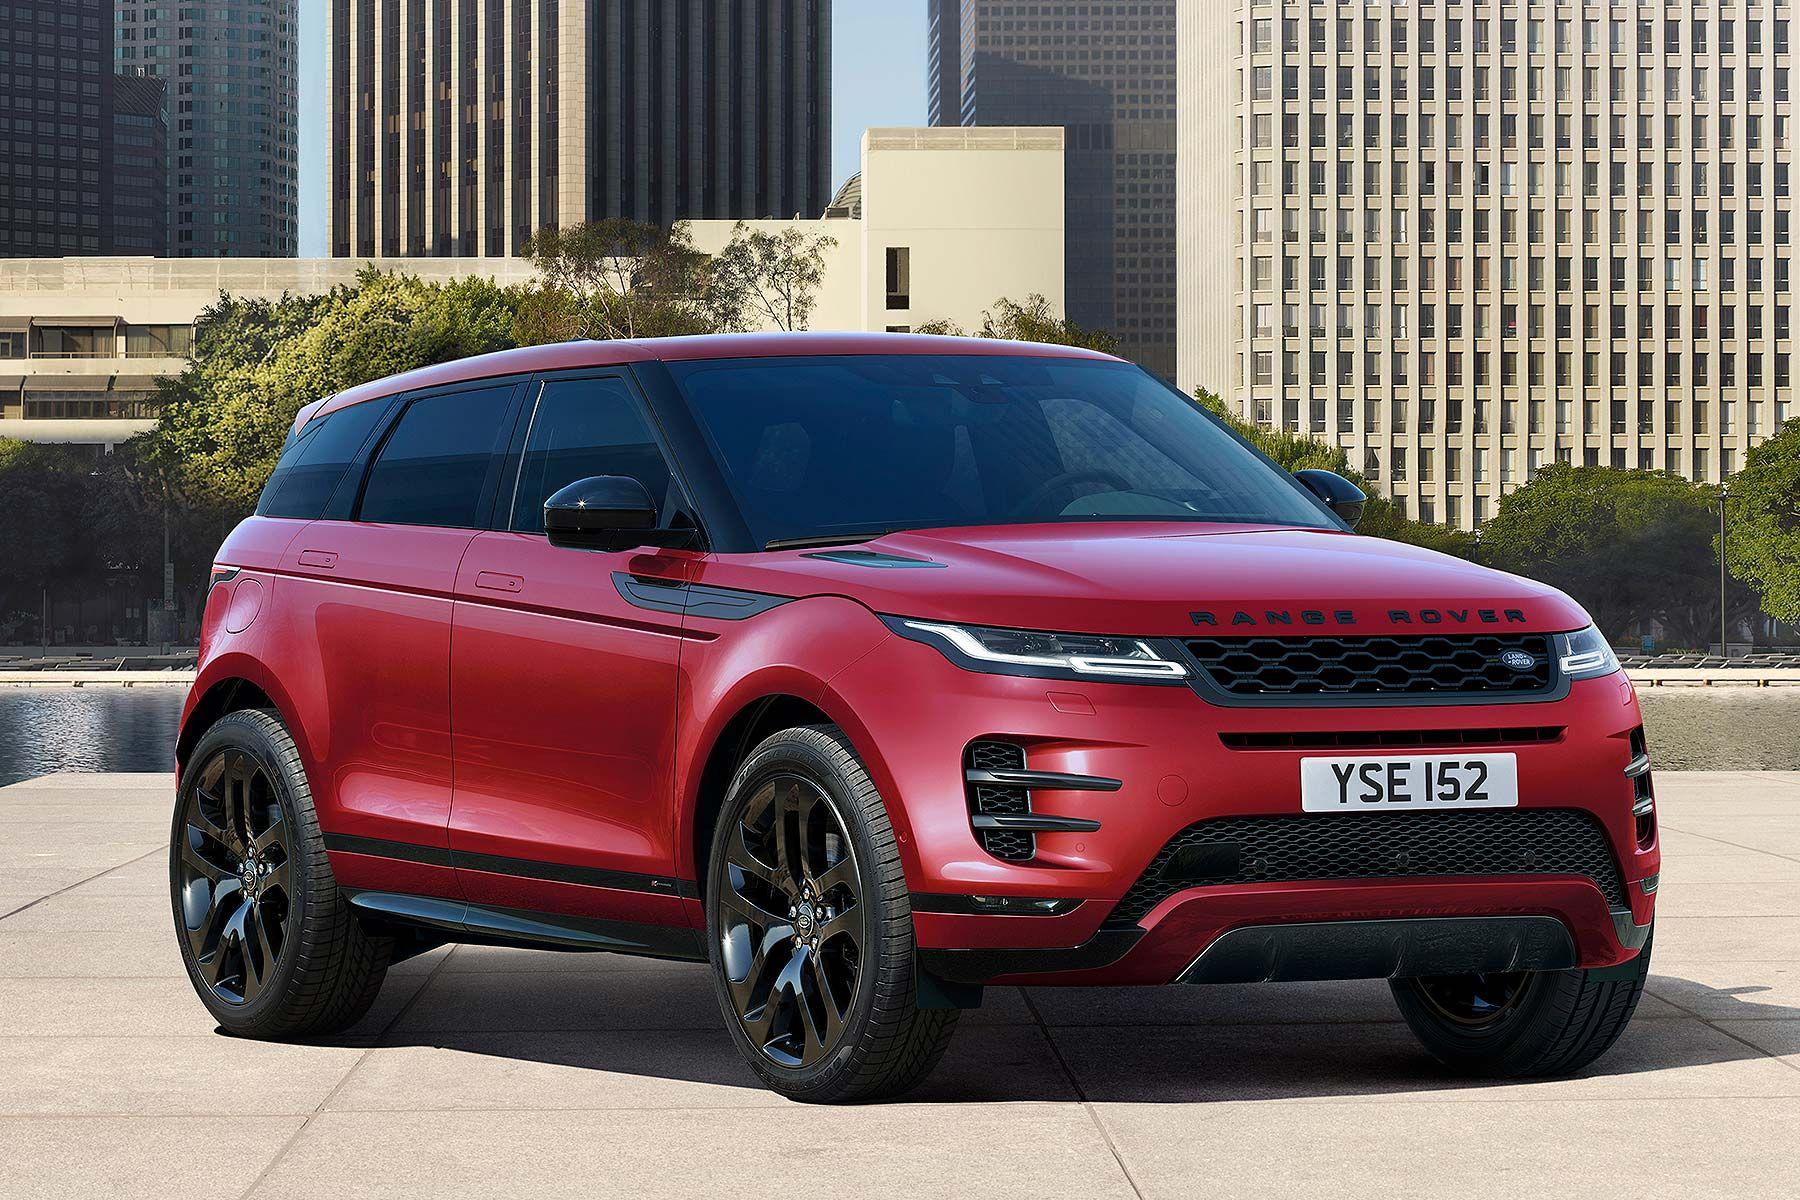 2019 Range Rover Evoque Range rover evoque, Red range